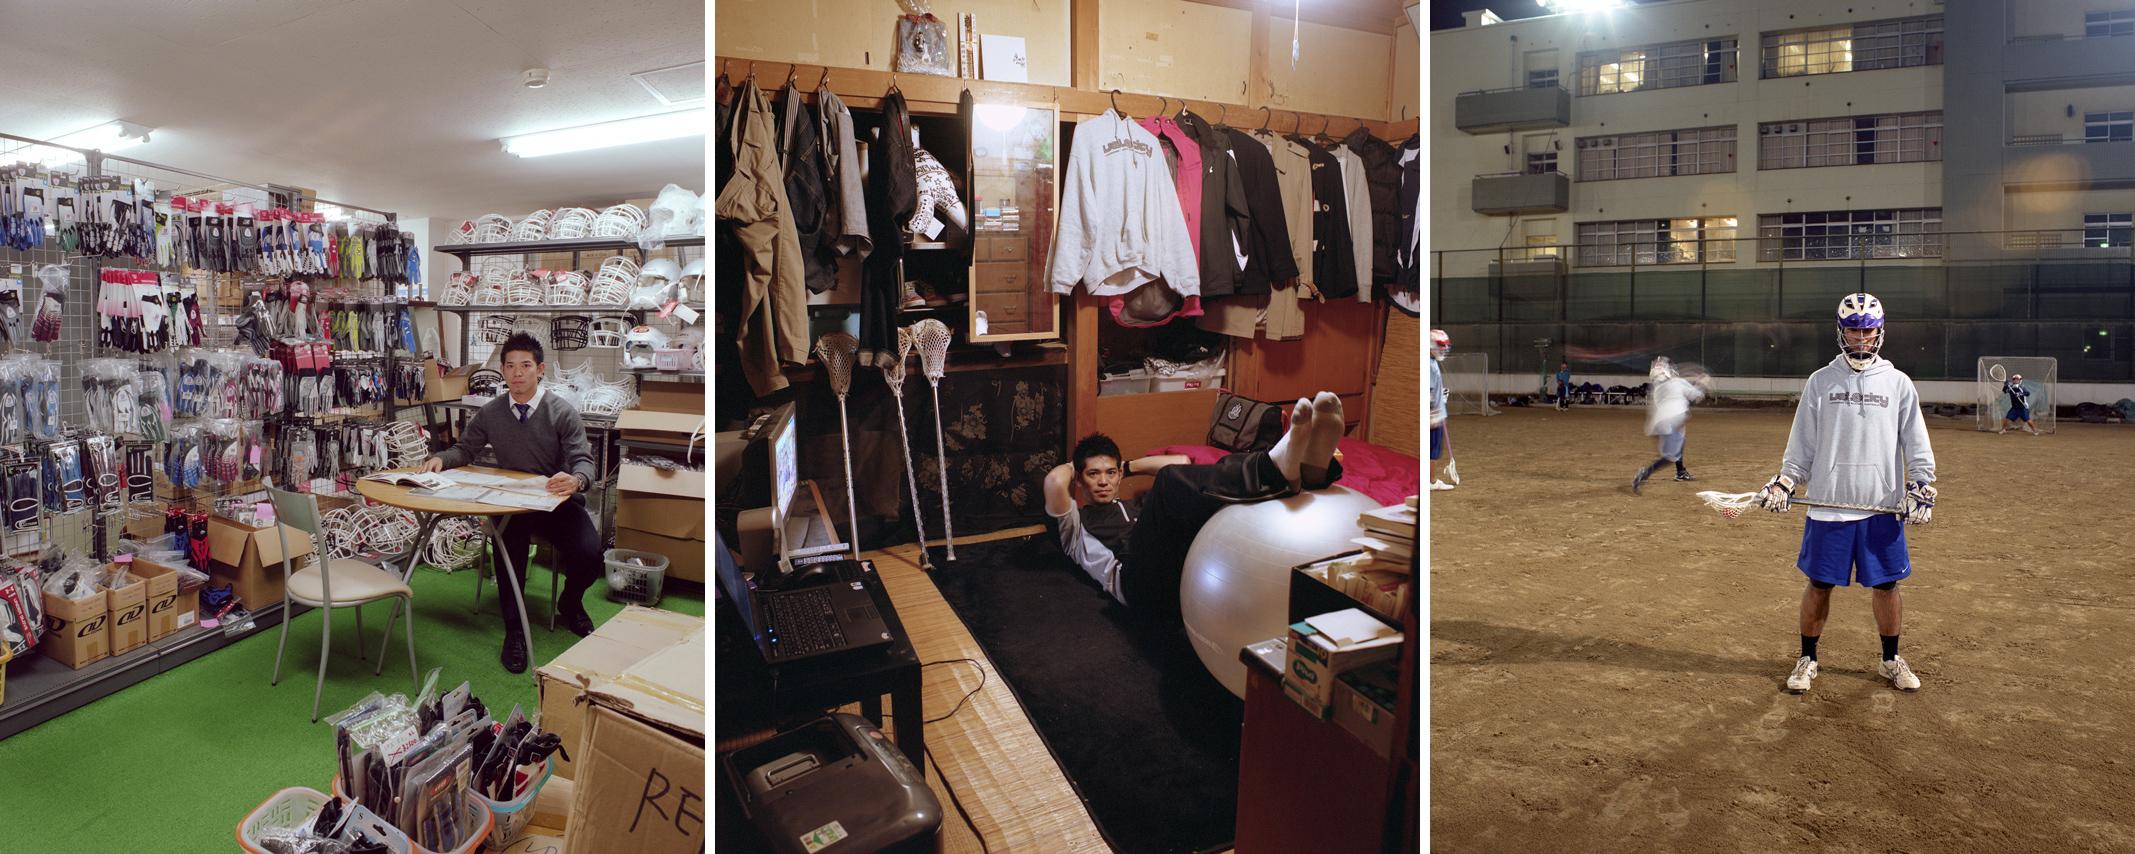 "PeeP #14 ""スポーツ用品店員 Salesman of Sporting Goods"""